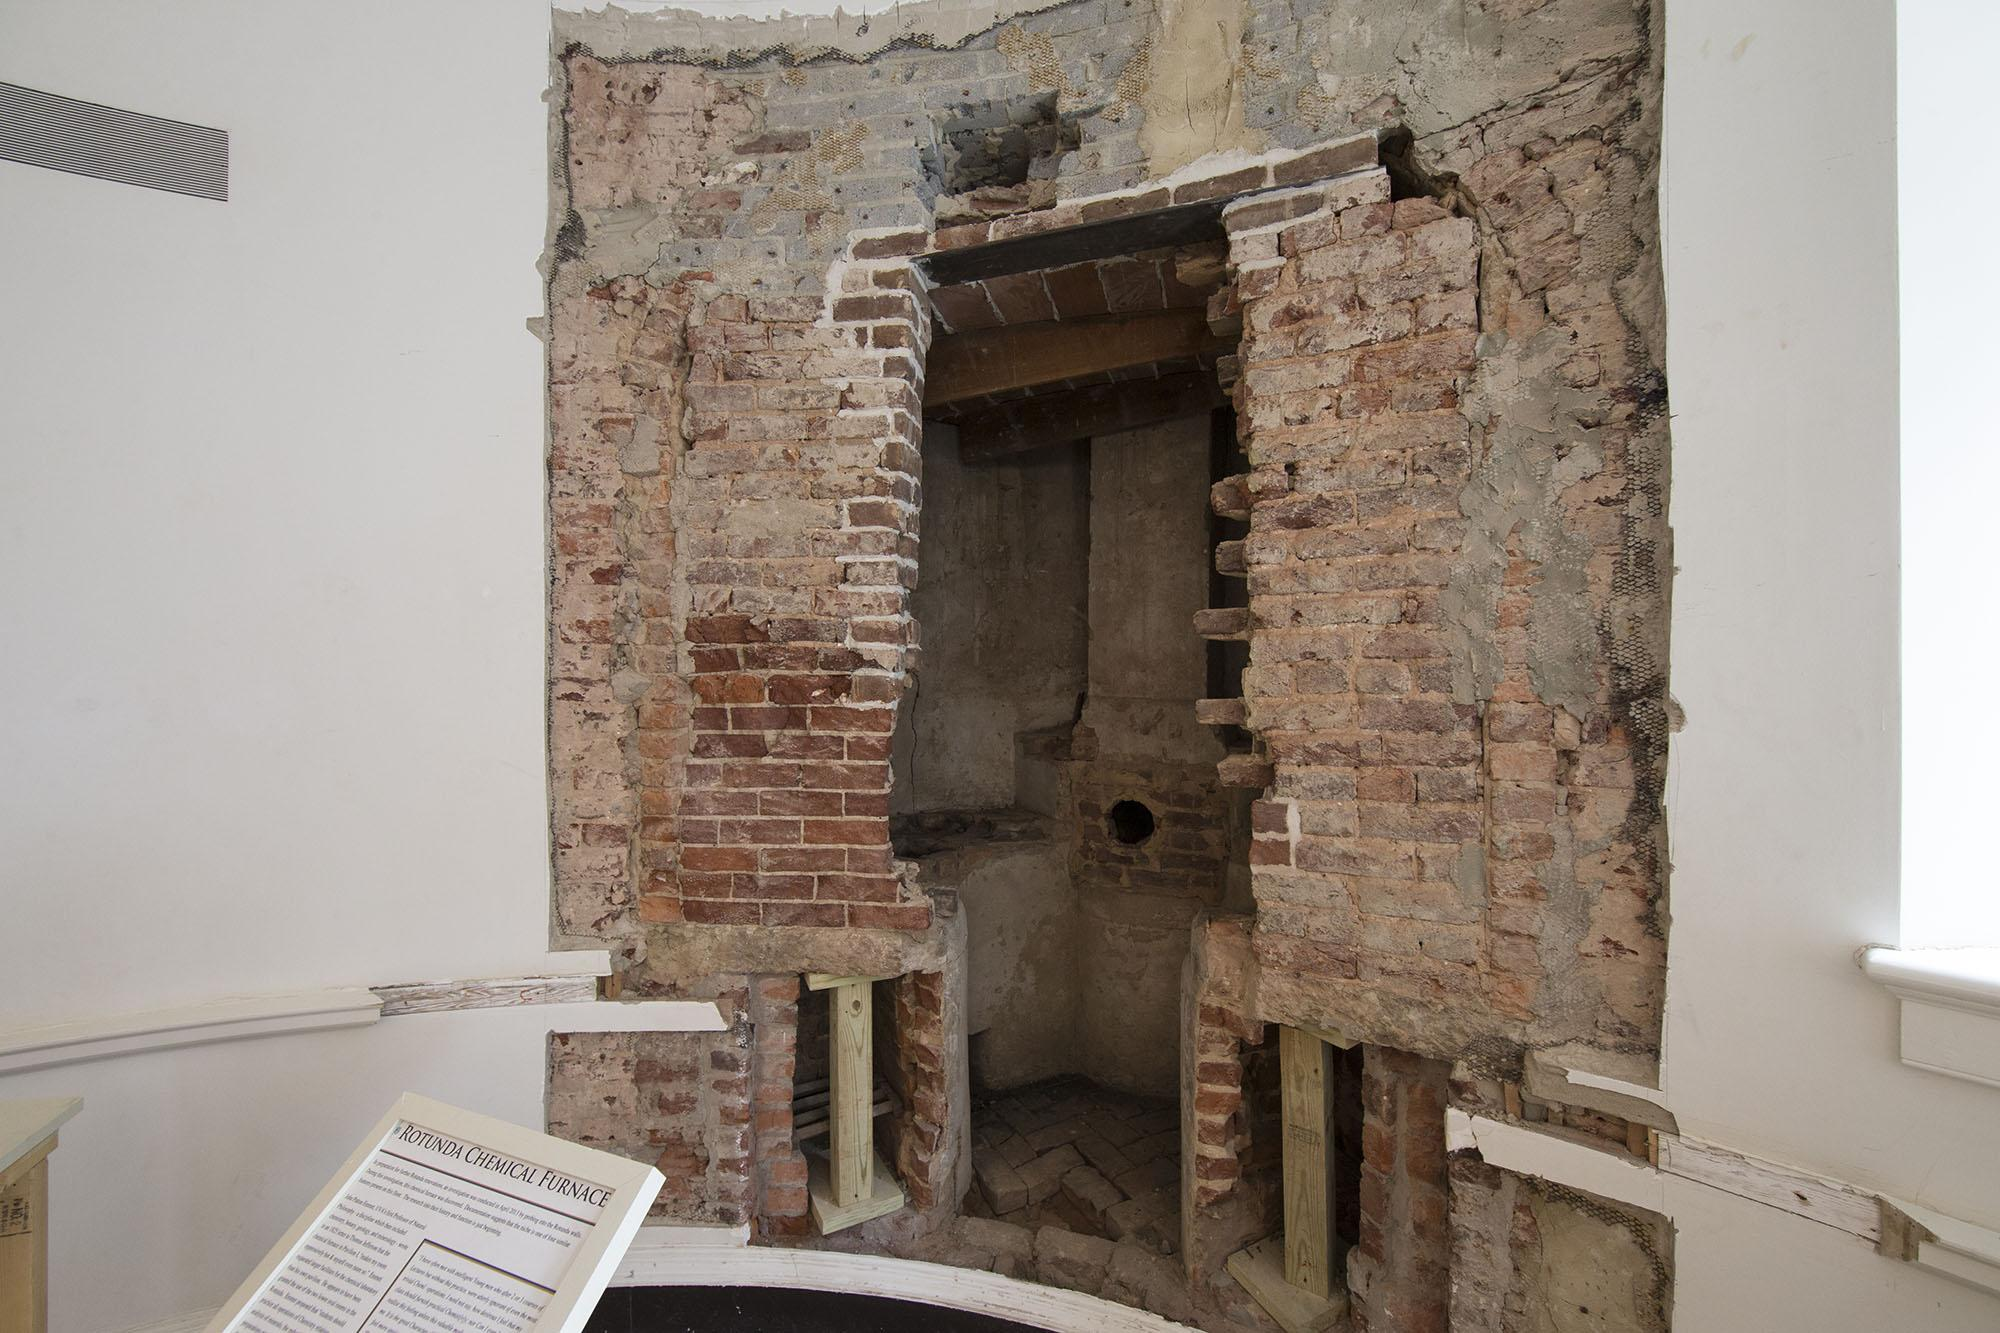 Jeffersonian Era Chemistry Hearth Preserved In Rotunda Wall Uva Today